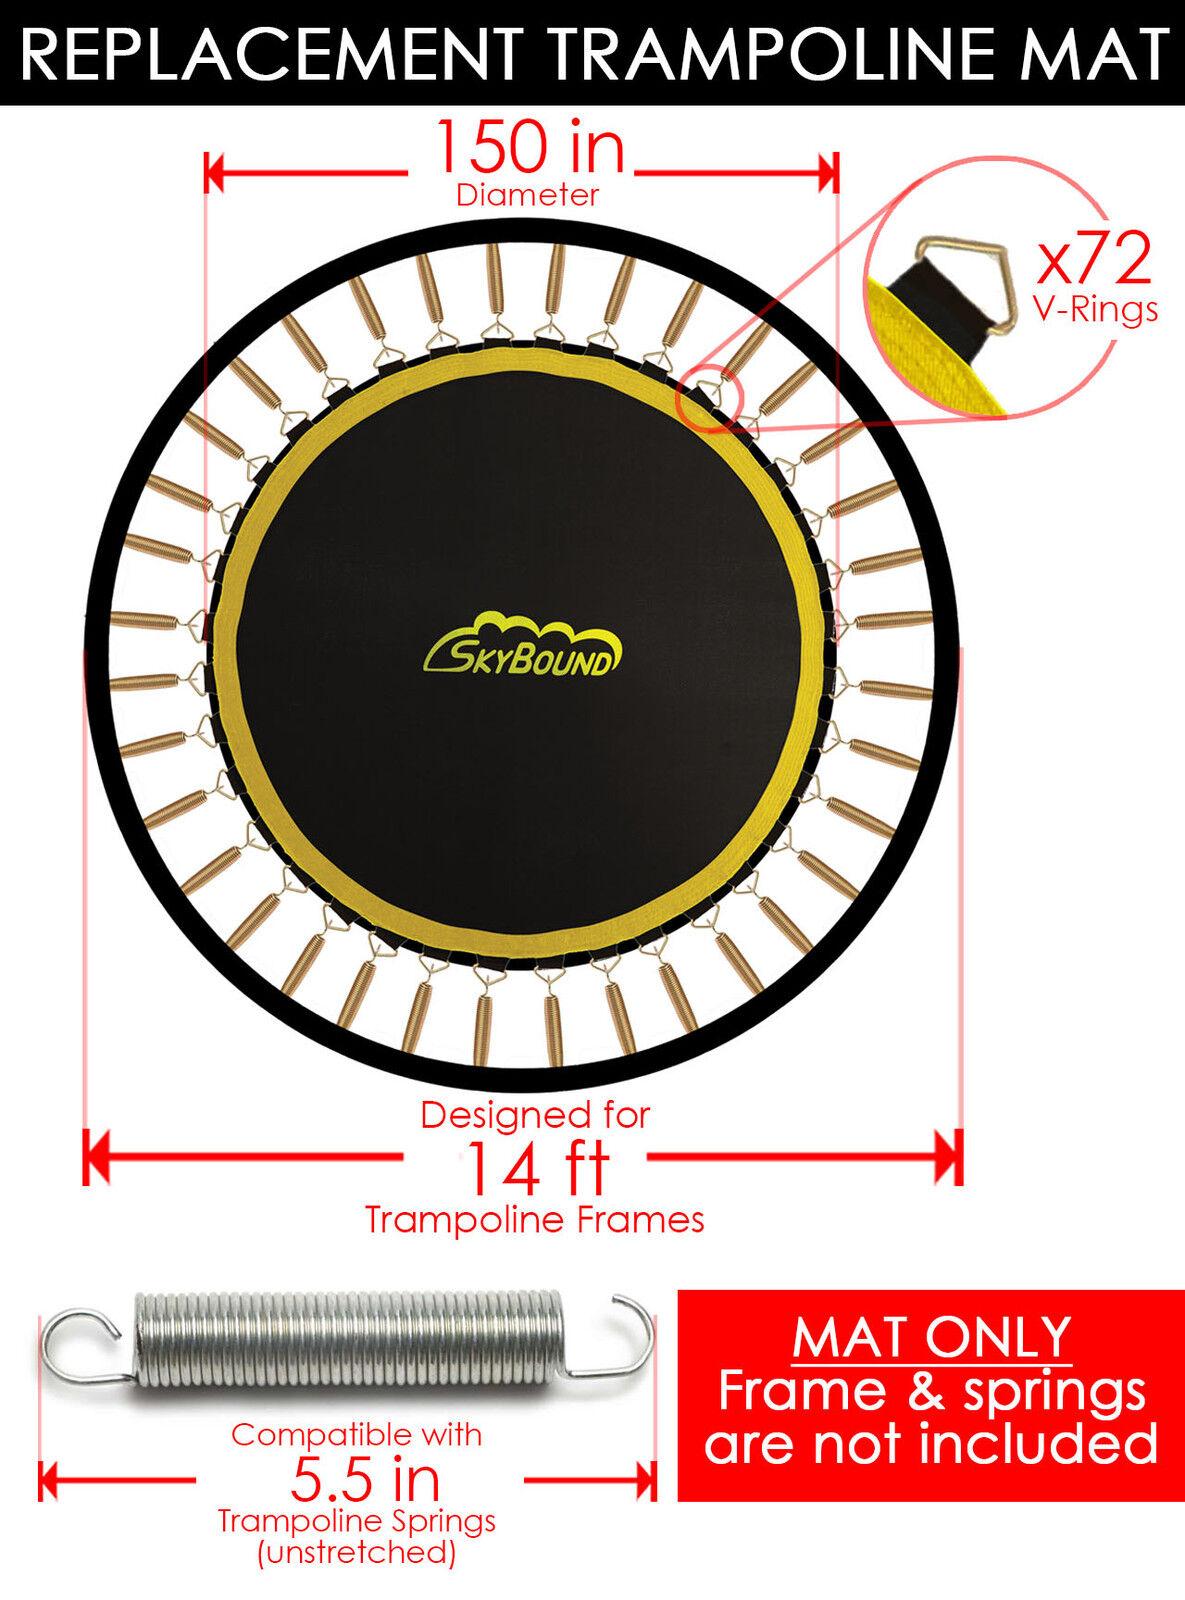 SkyBound Premium 150 Trampoline Mat w72 VRings for BounceProTR1463AENCWMC